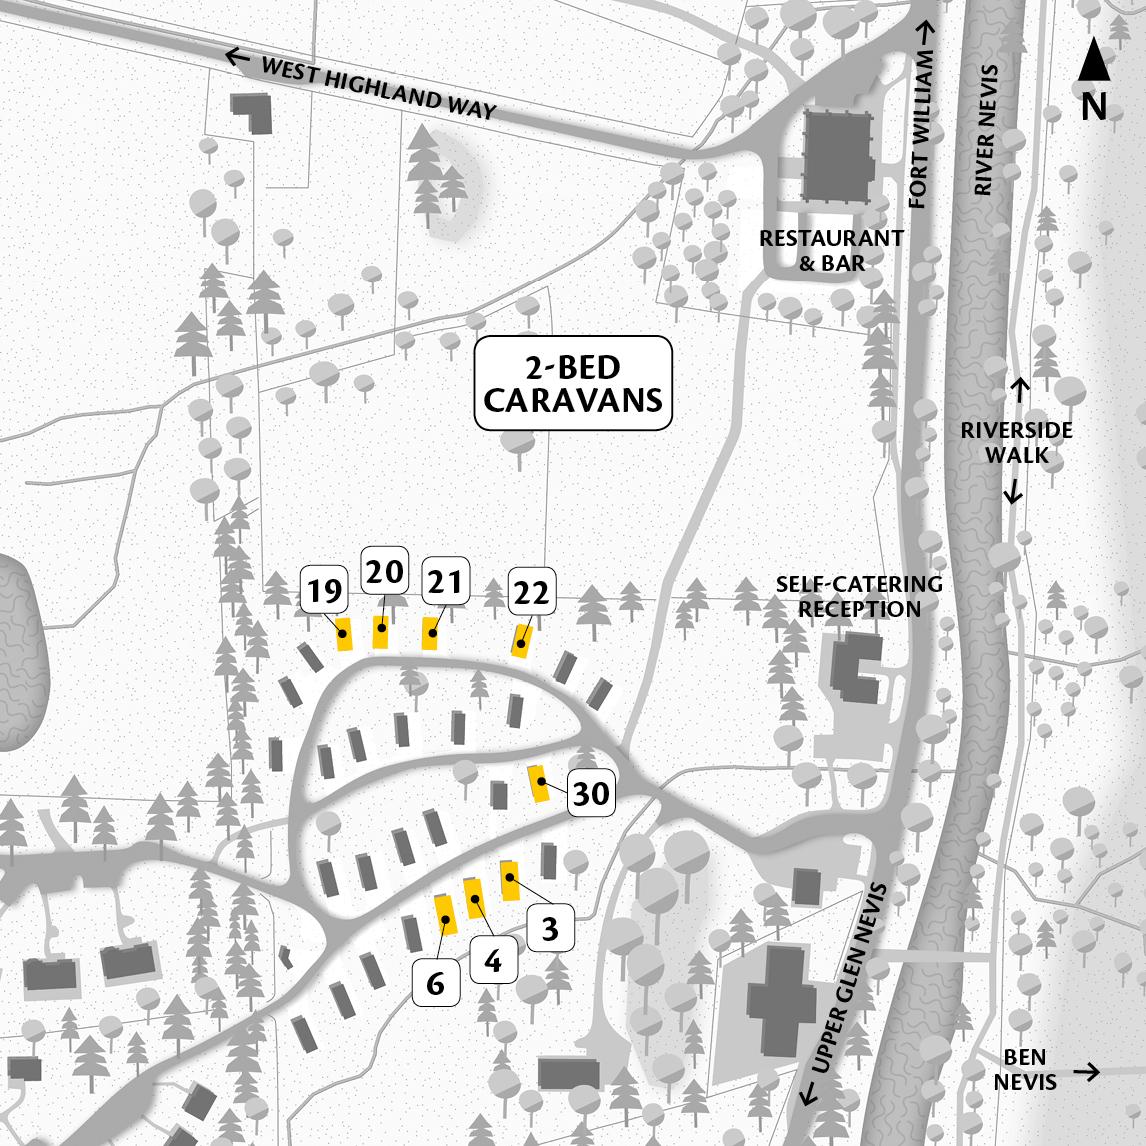 GNH-Map-SelfCatering-WebUnits-Caravan-2Bed.jpg